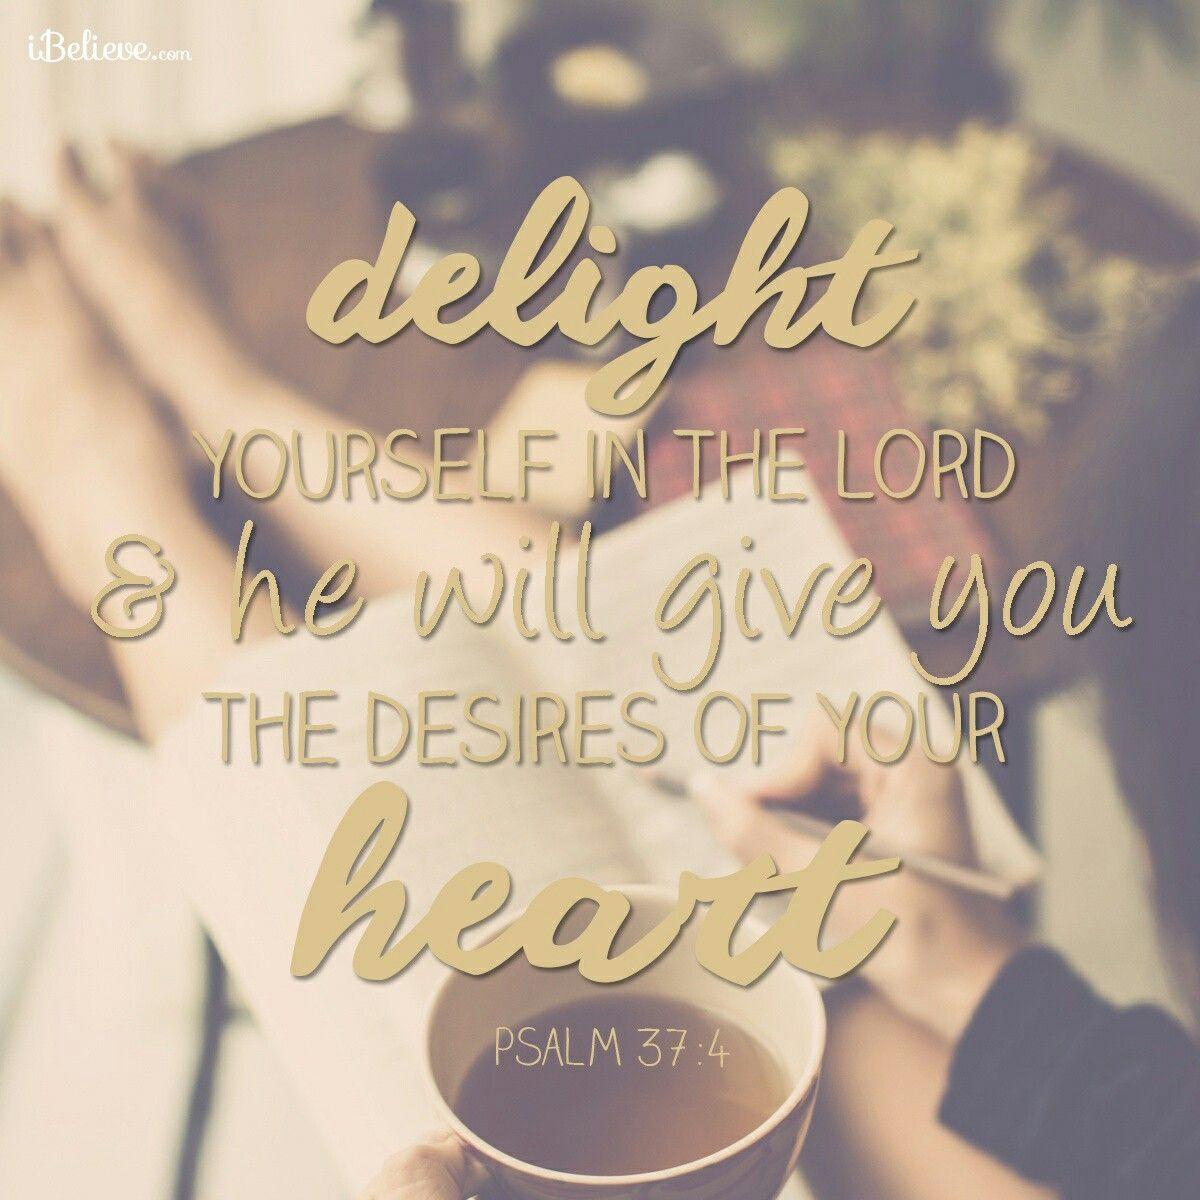 Ps 37:4